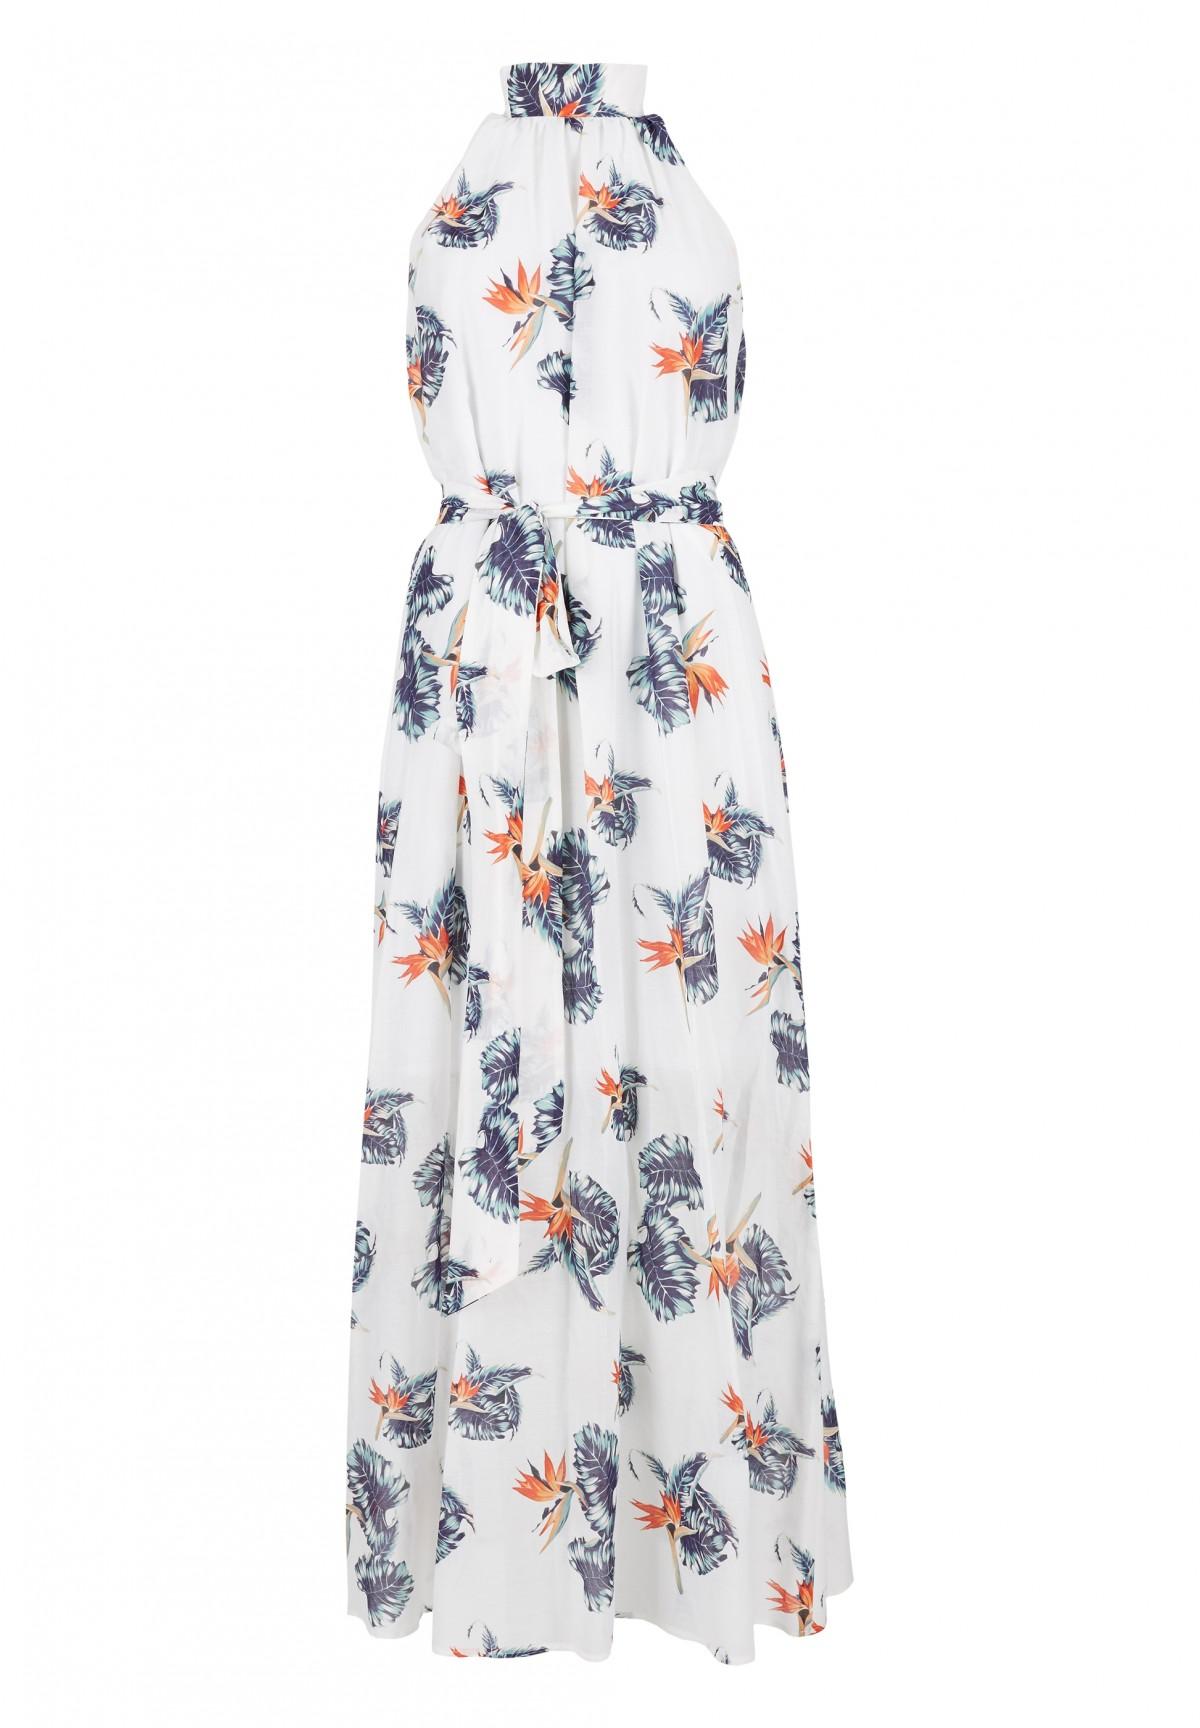 Maxi-Kleid mit floralem Muster / Maxikleid